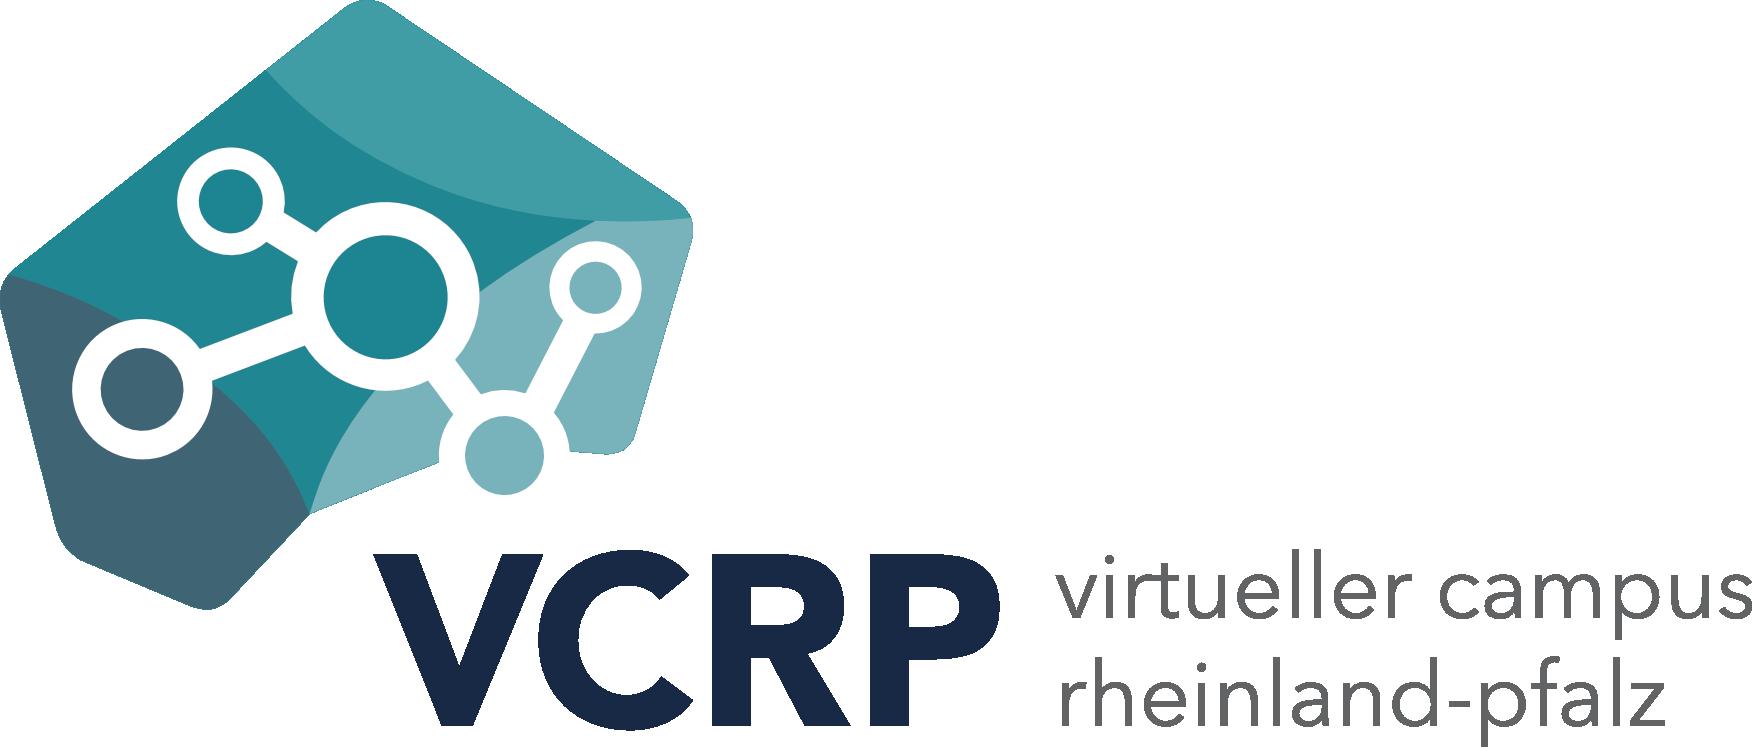 Logo Virtueller Campus Rheinland-Pfalz